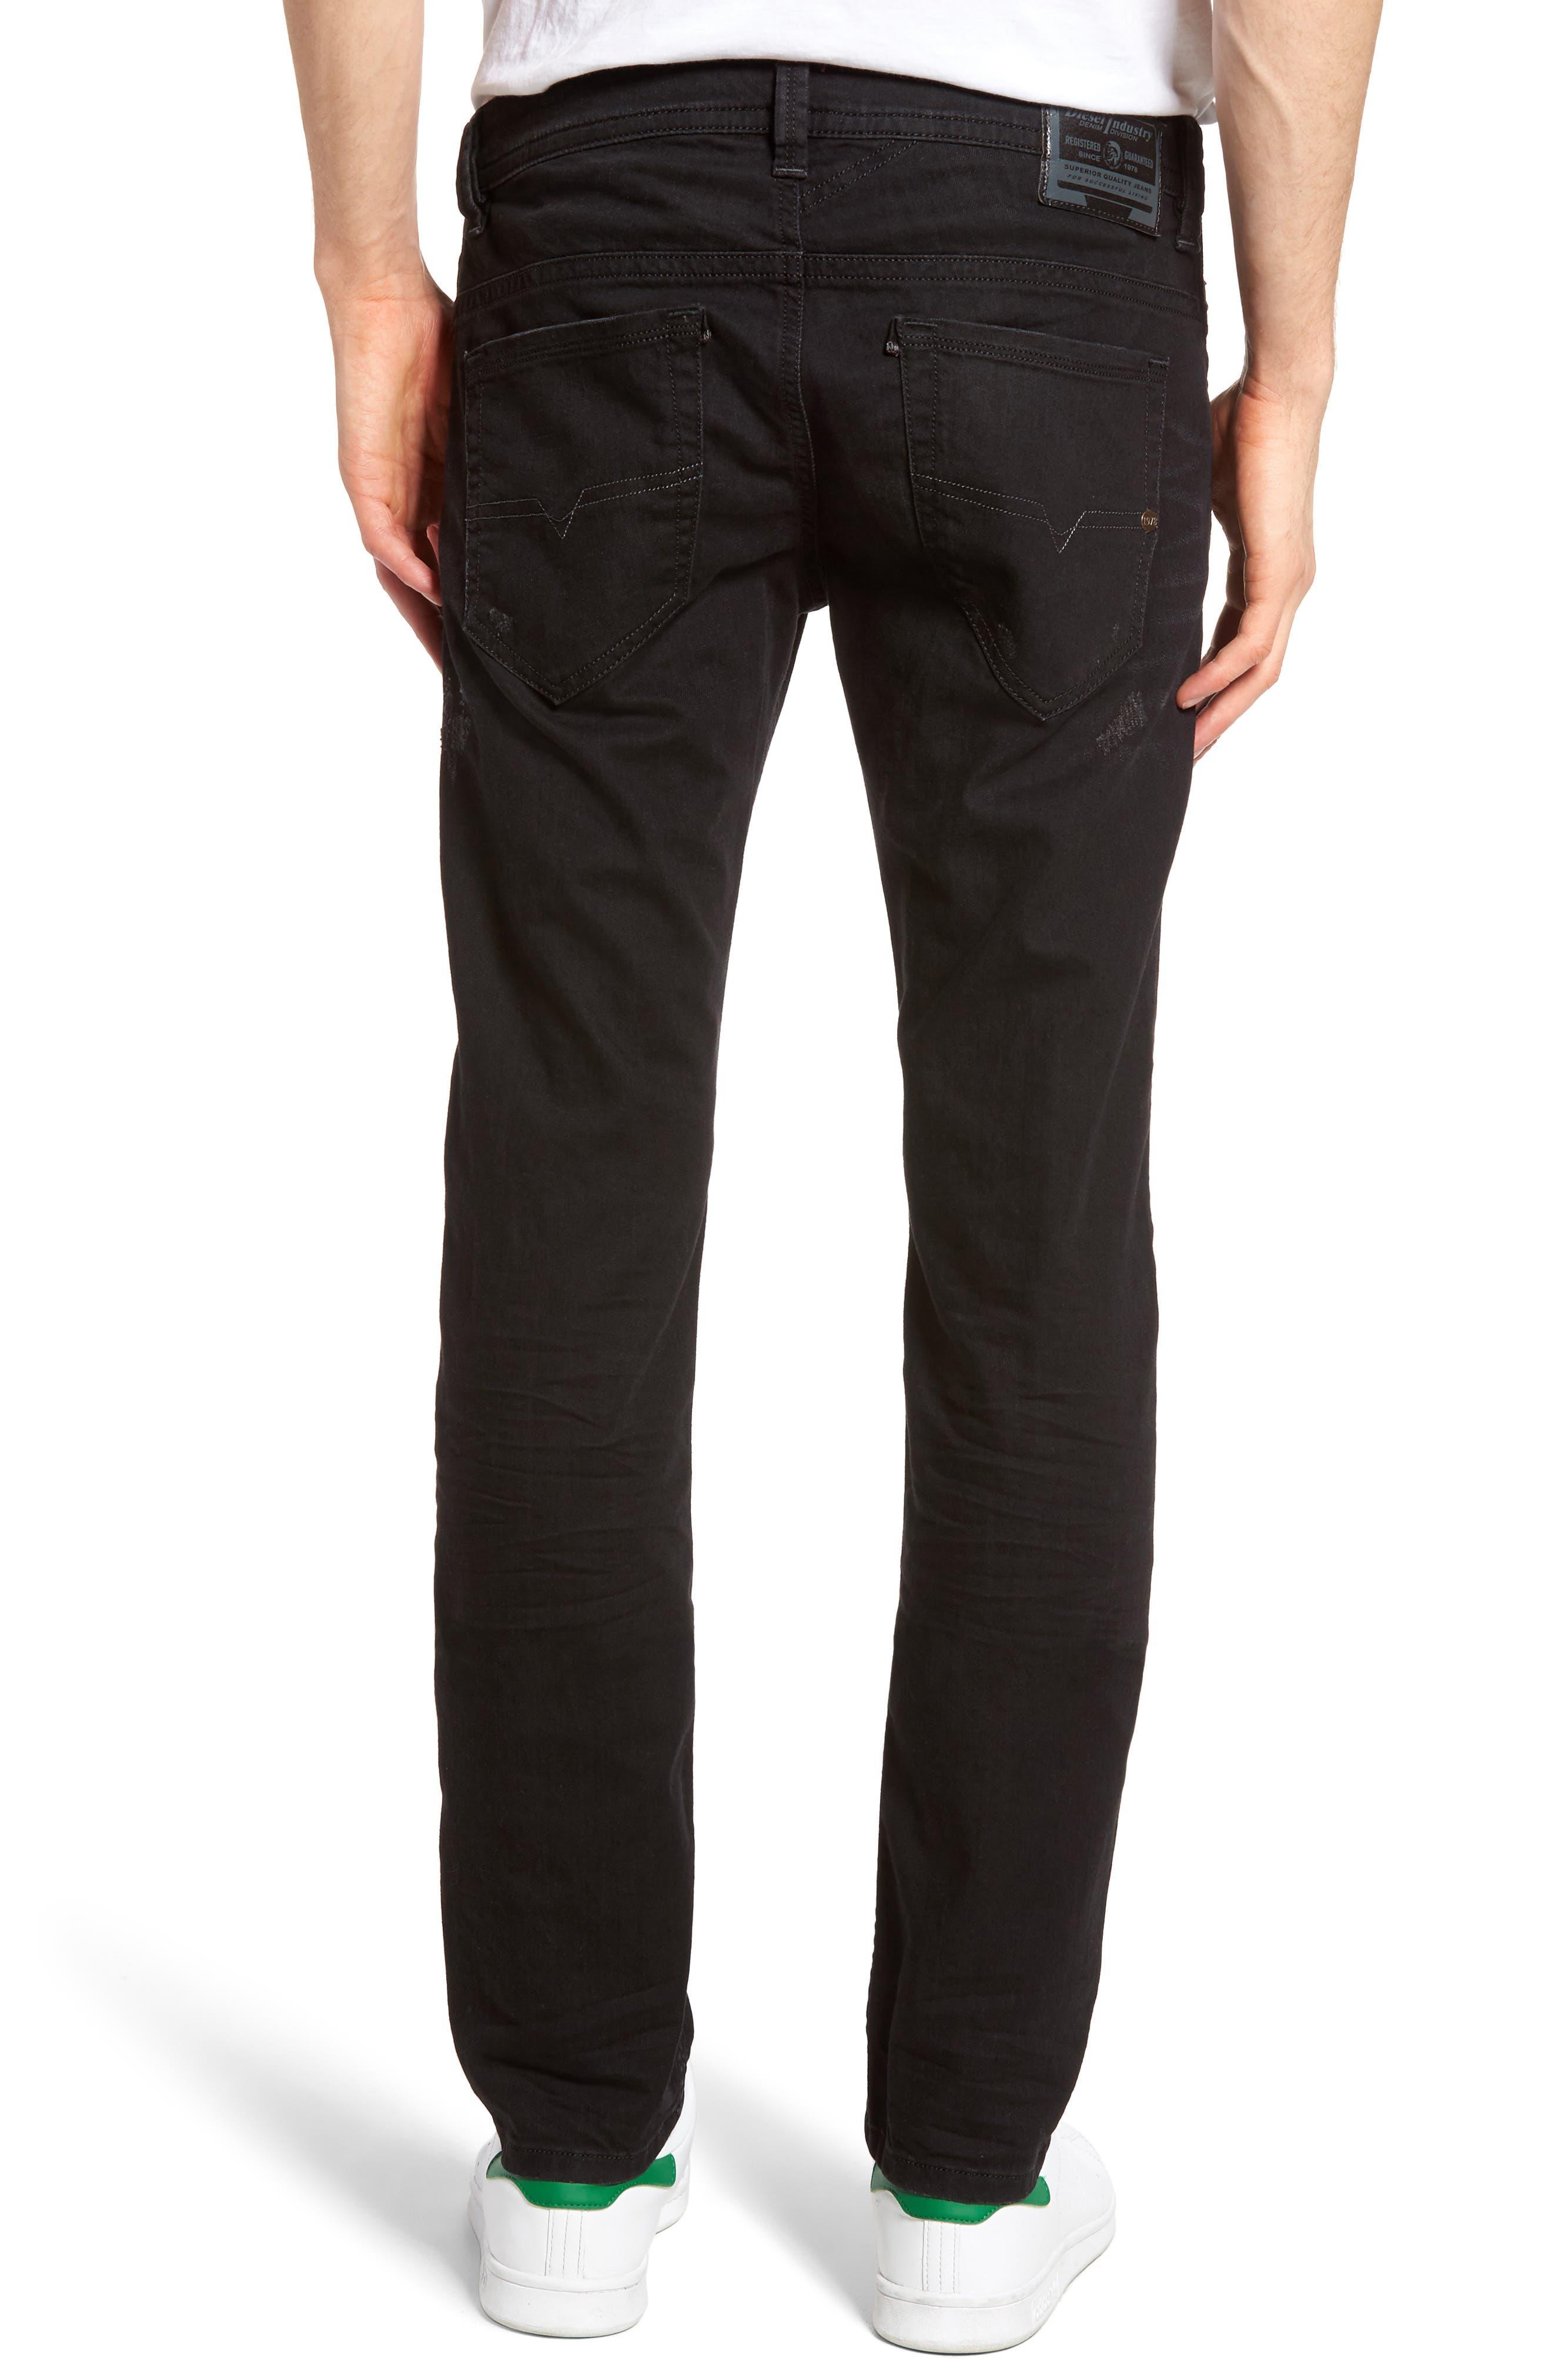 Thavar Skinny Fit Jeans,                             Alternate thumbnail 2, color,                             008